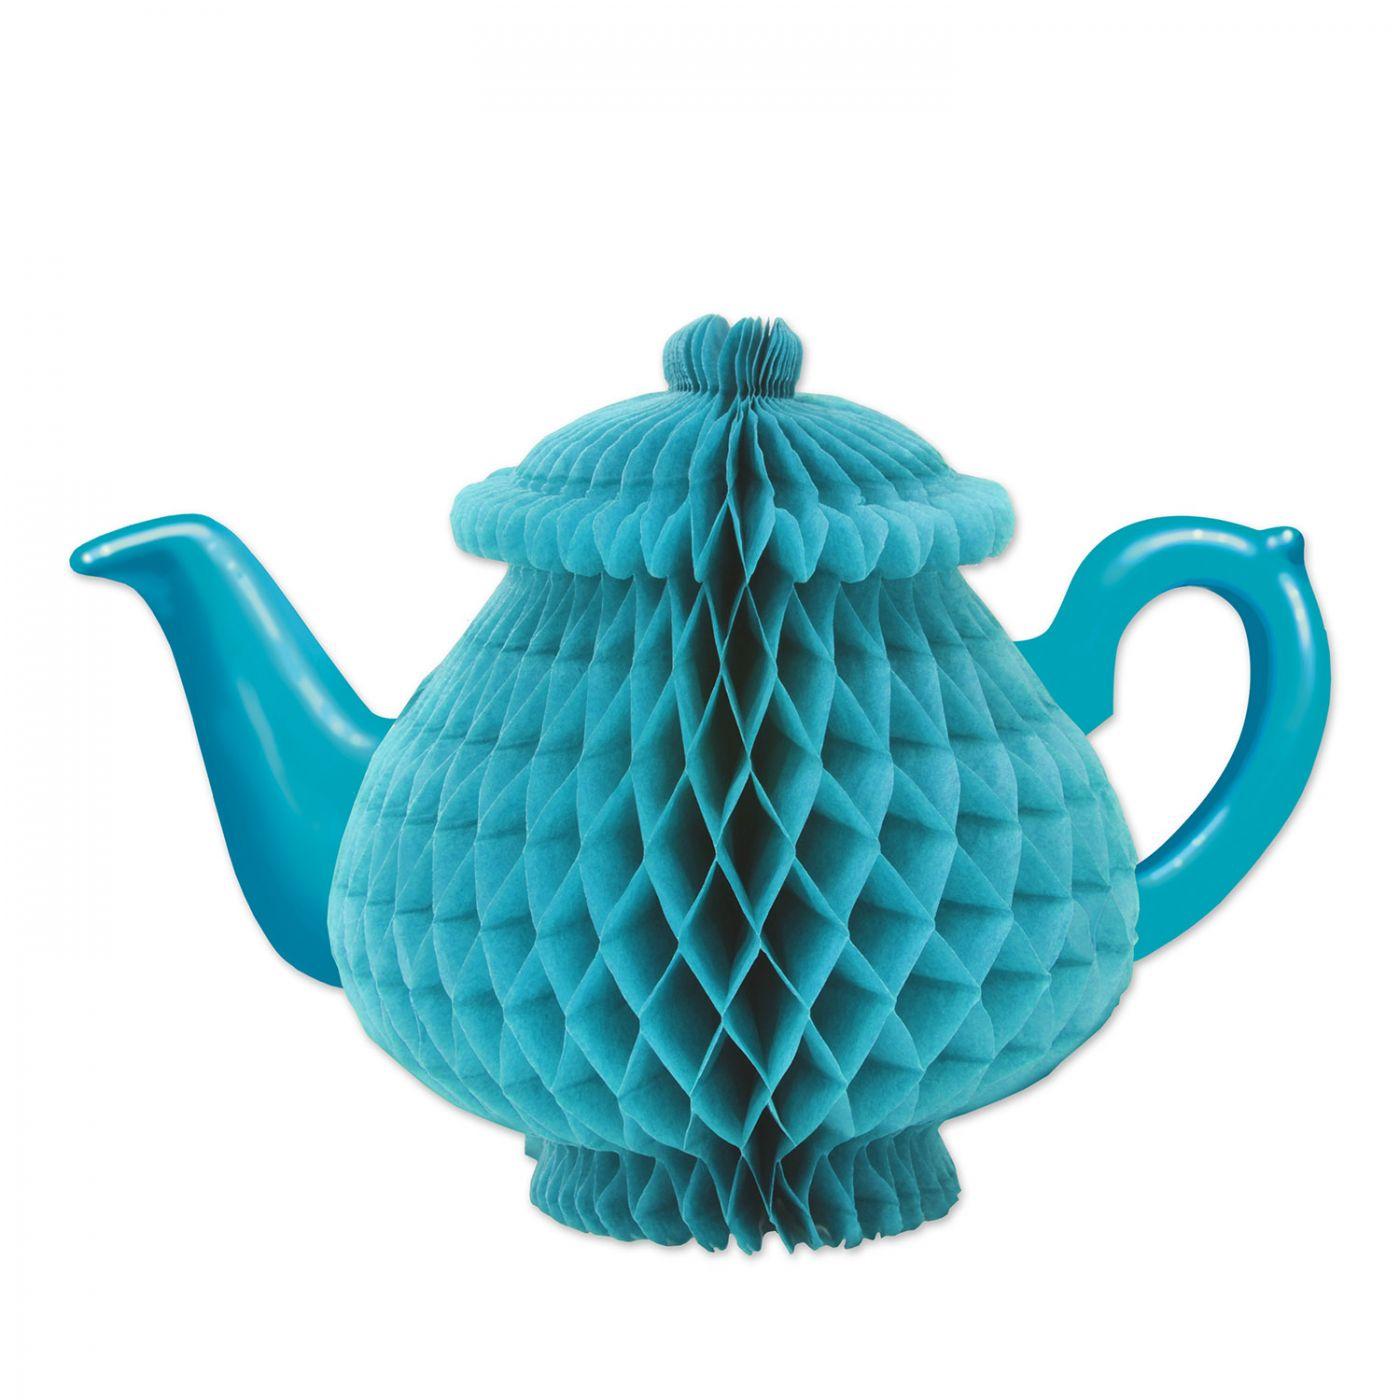 Tissue Teapot Centerpiece image